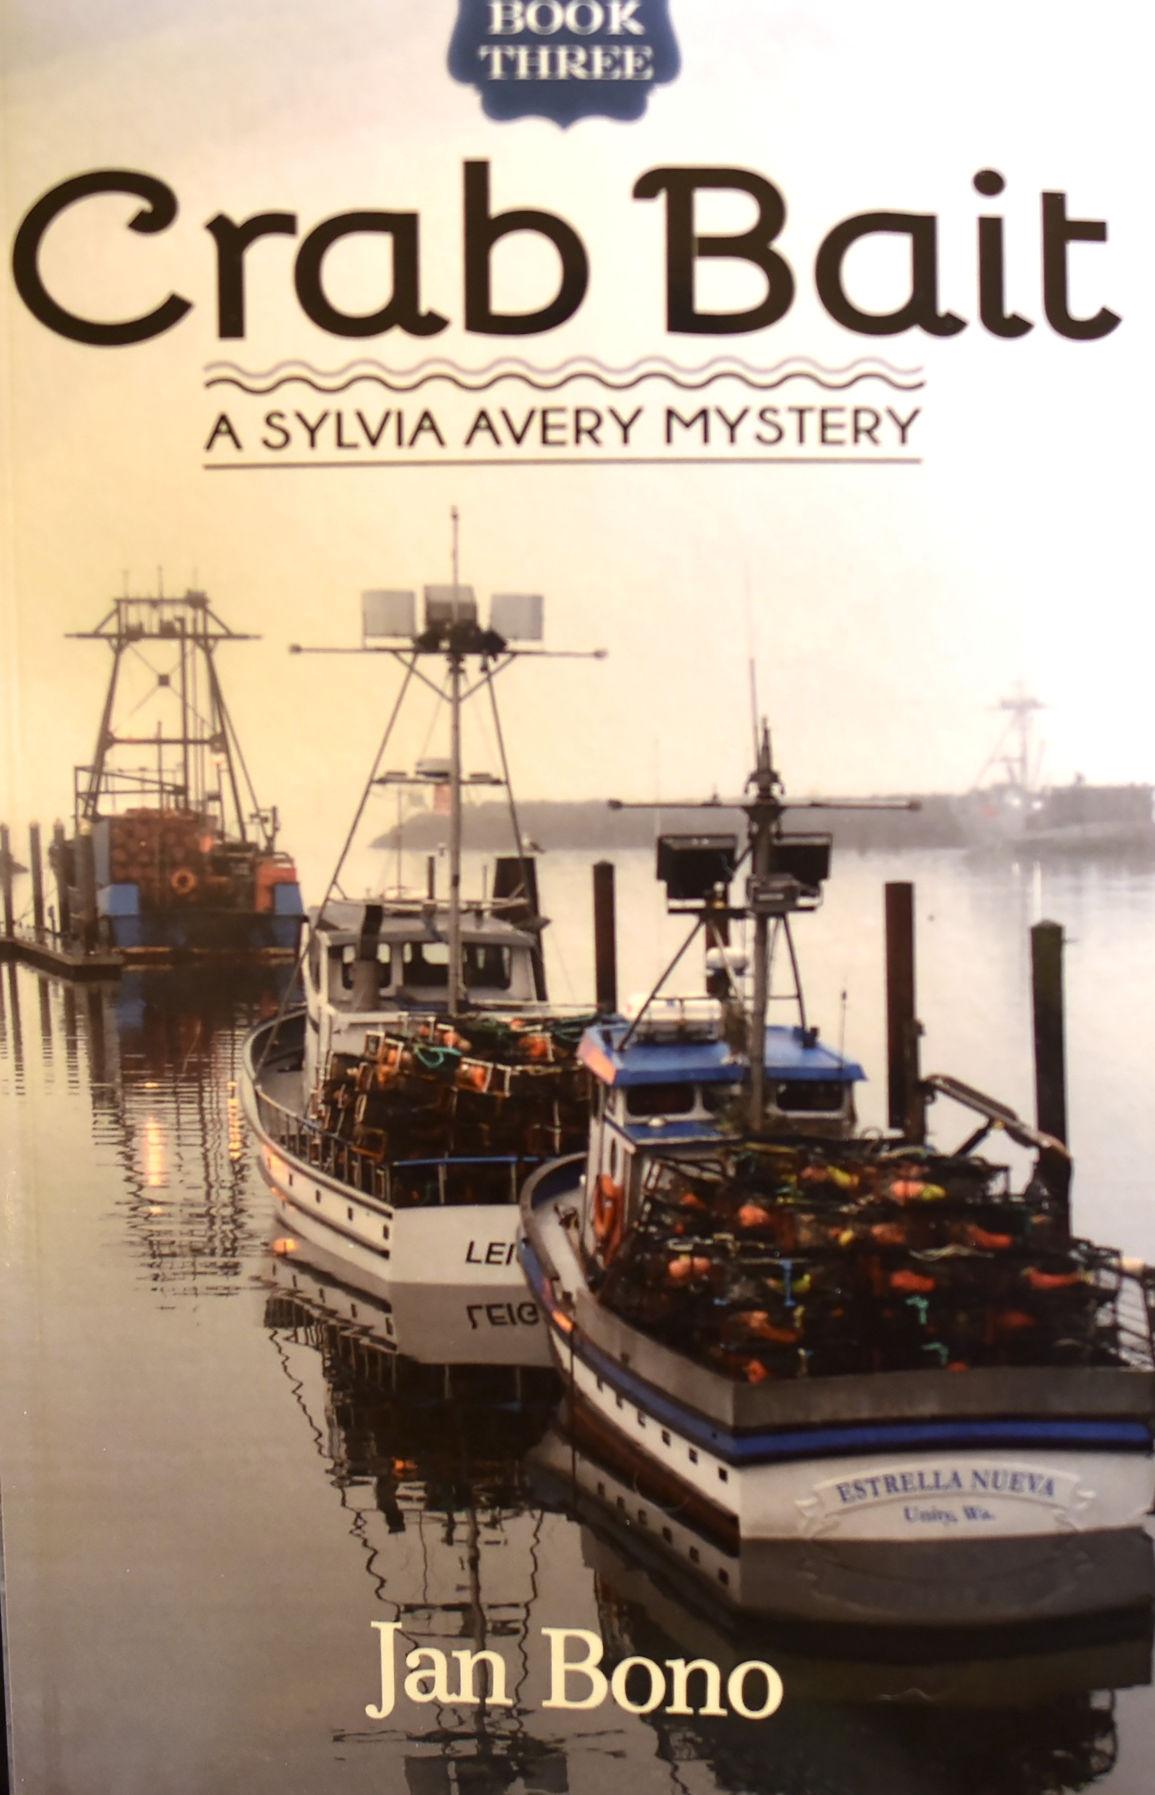 Crab Bait – Sylvia Avery Cozy Mystery Series, Book Three